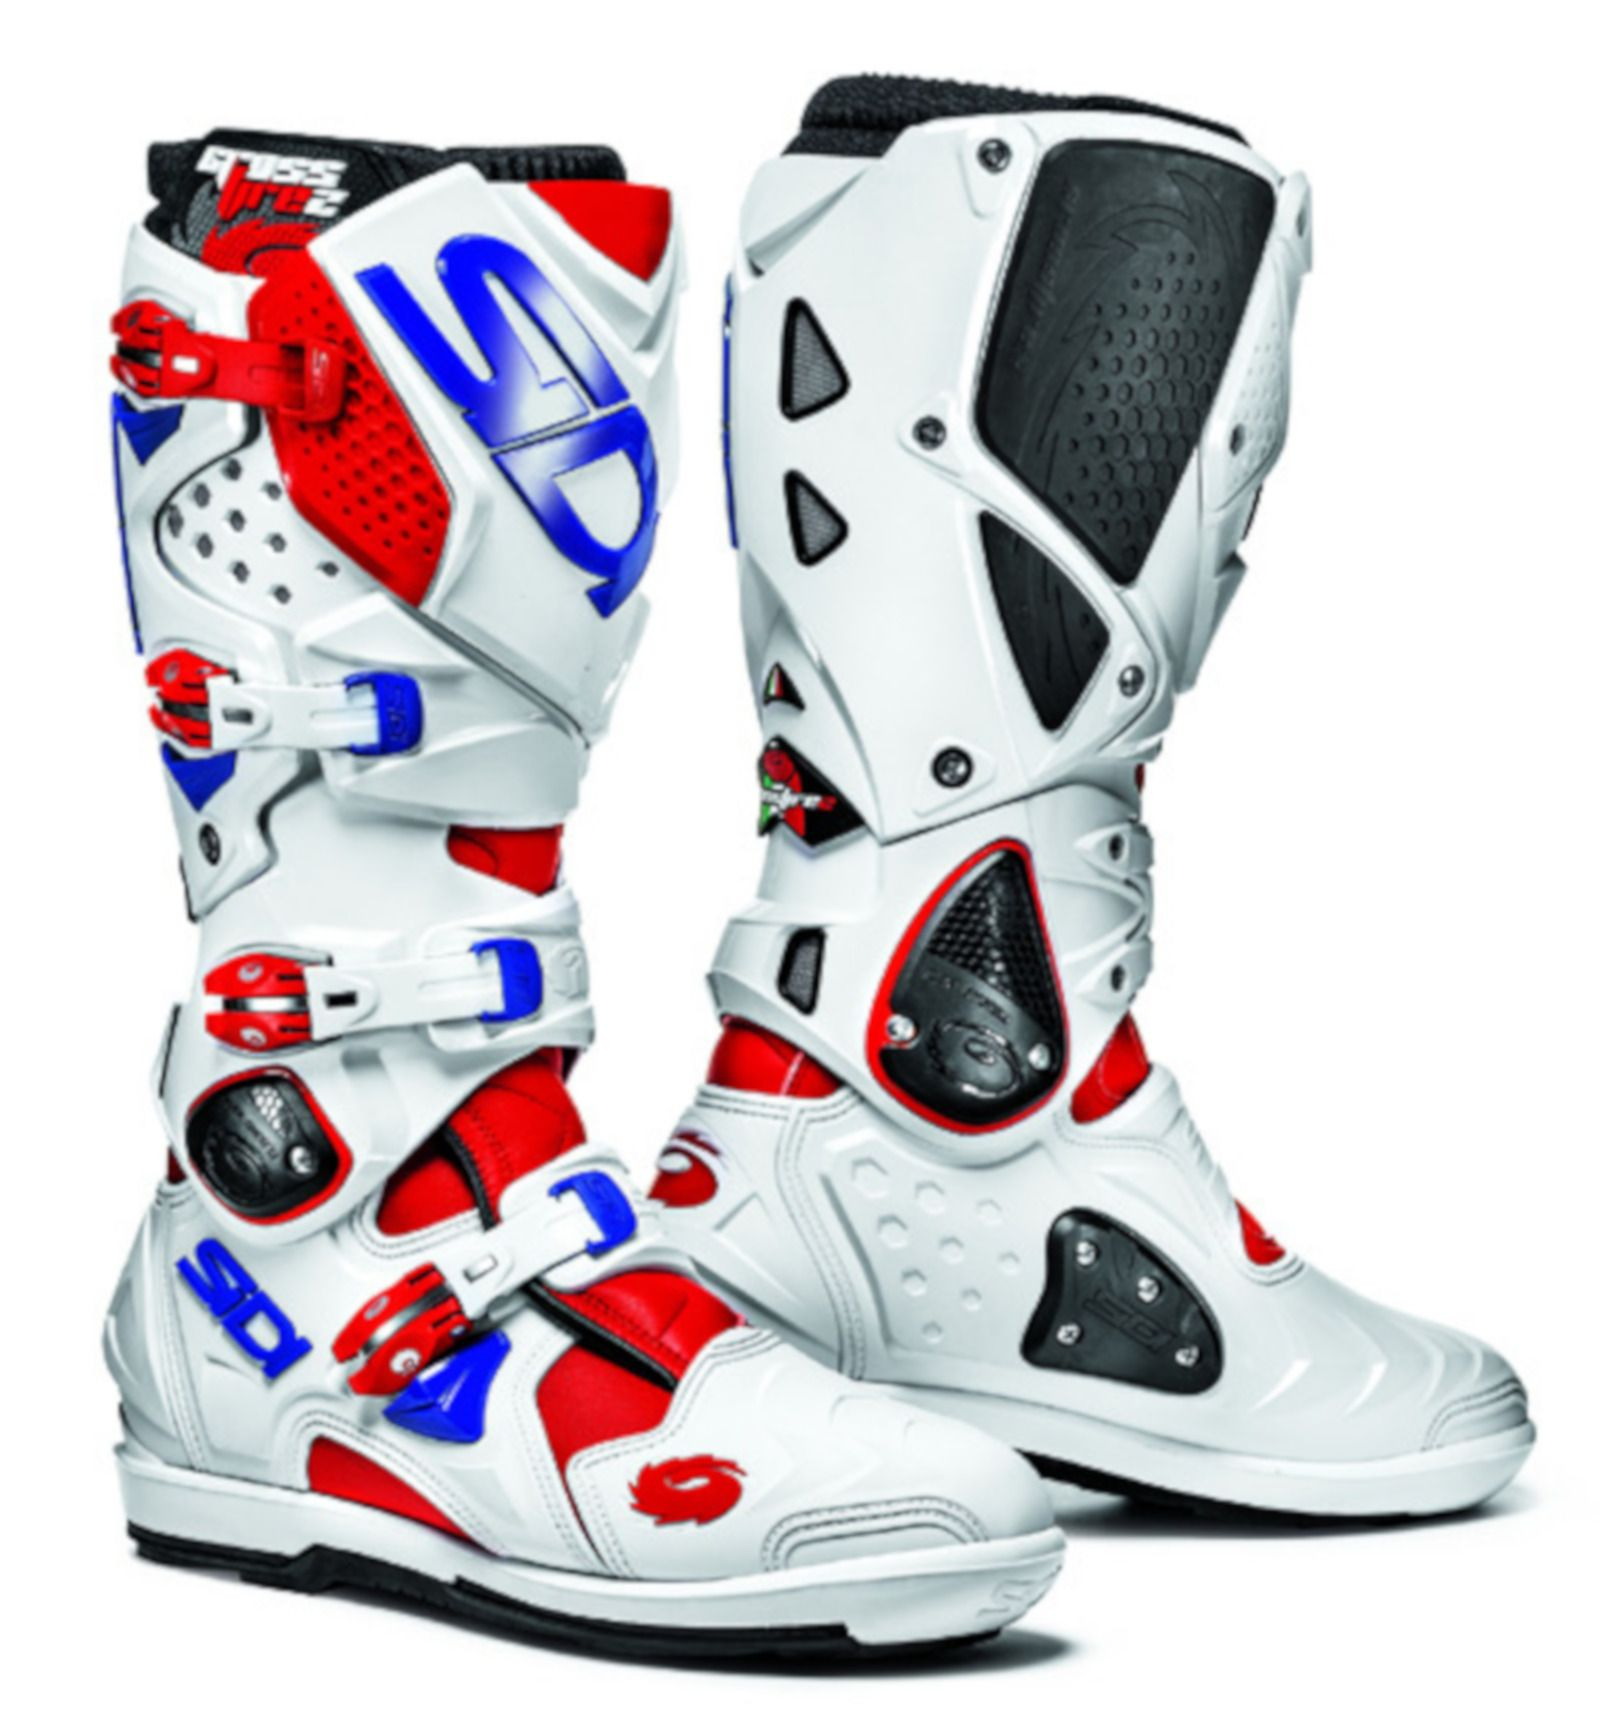 Details about Sidi Crossfire 2 SRS Motorcycle Motocross Enduro Boots RedWhiteBlue SALE